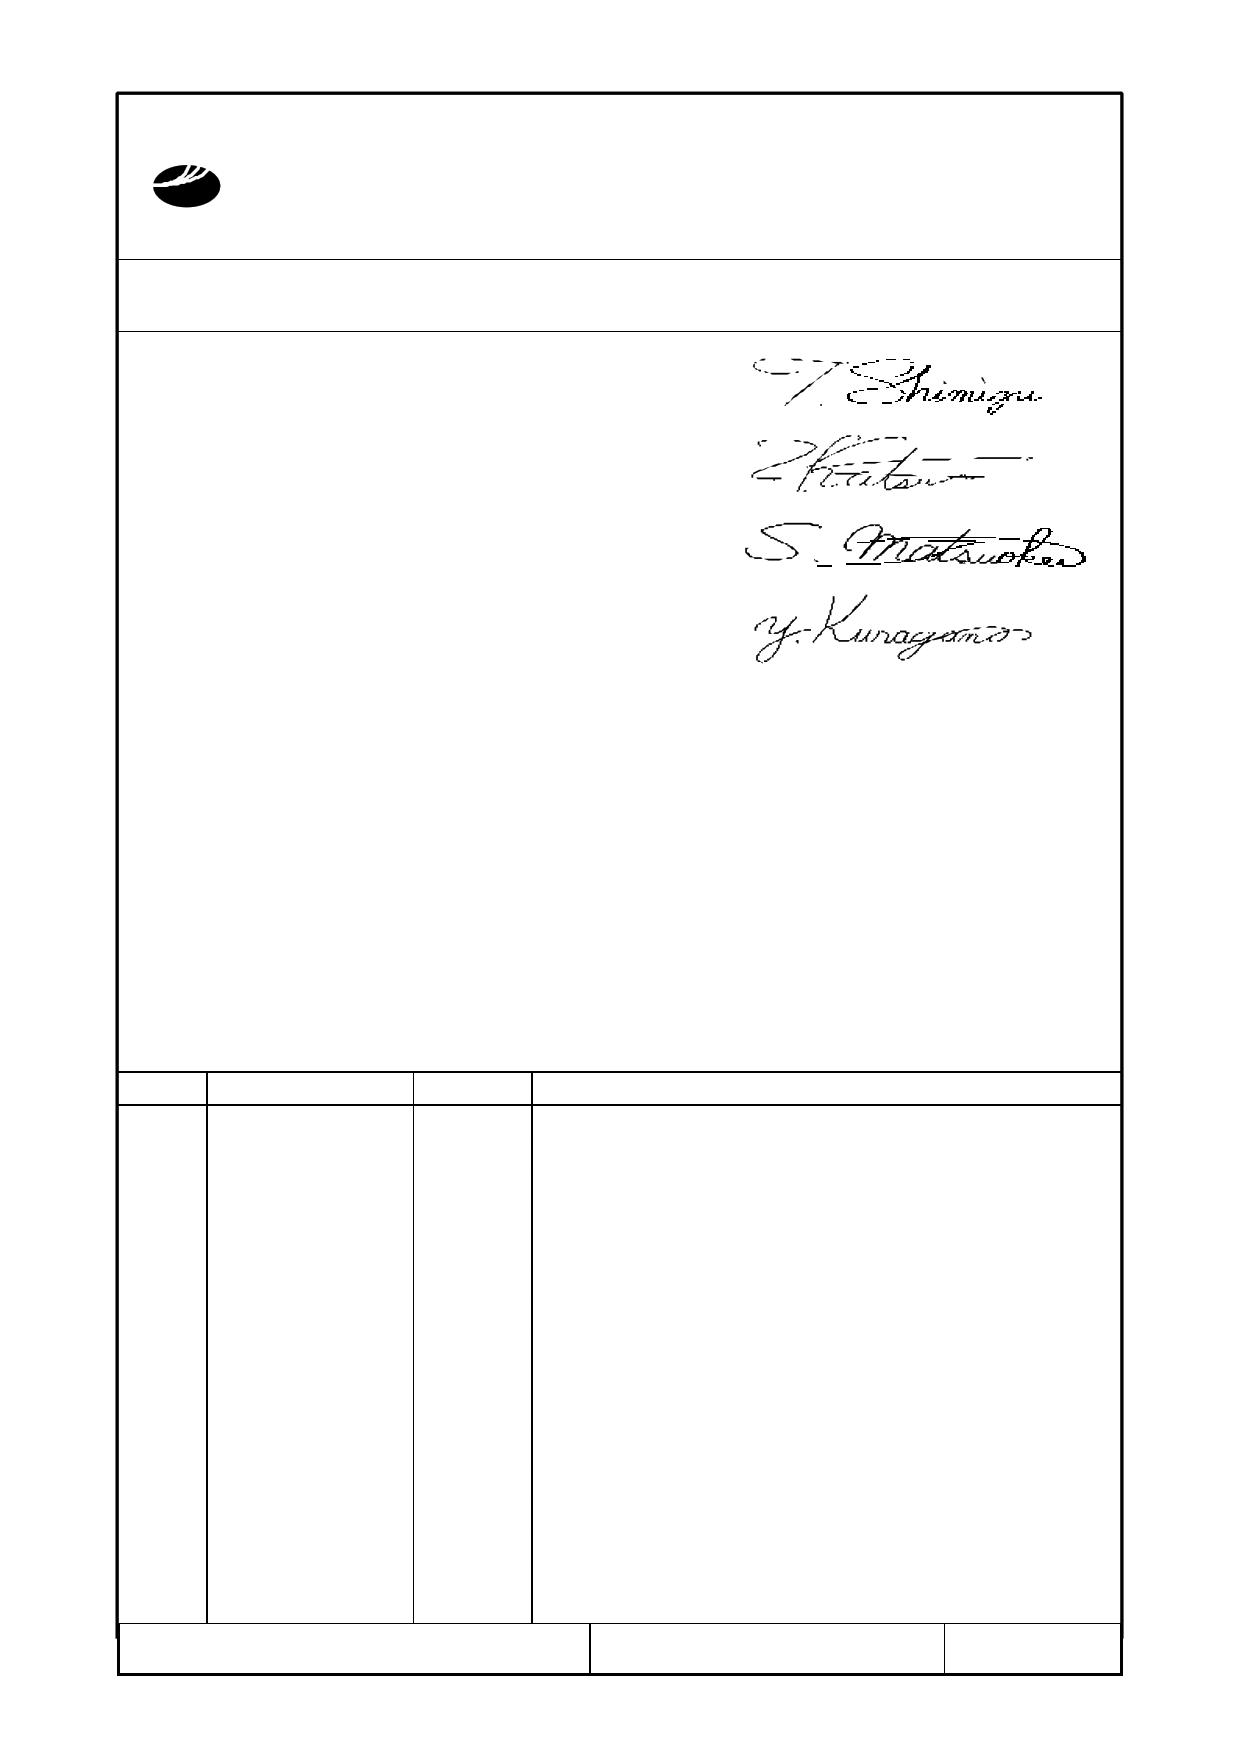 C-51496GNFJ-AB دیتاشیت PDF